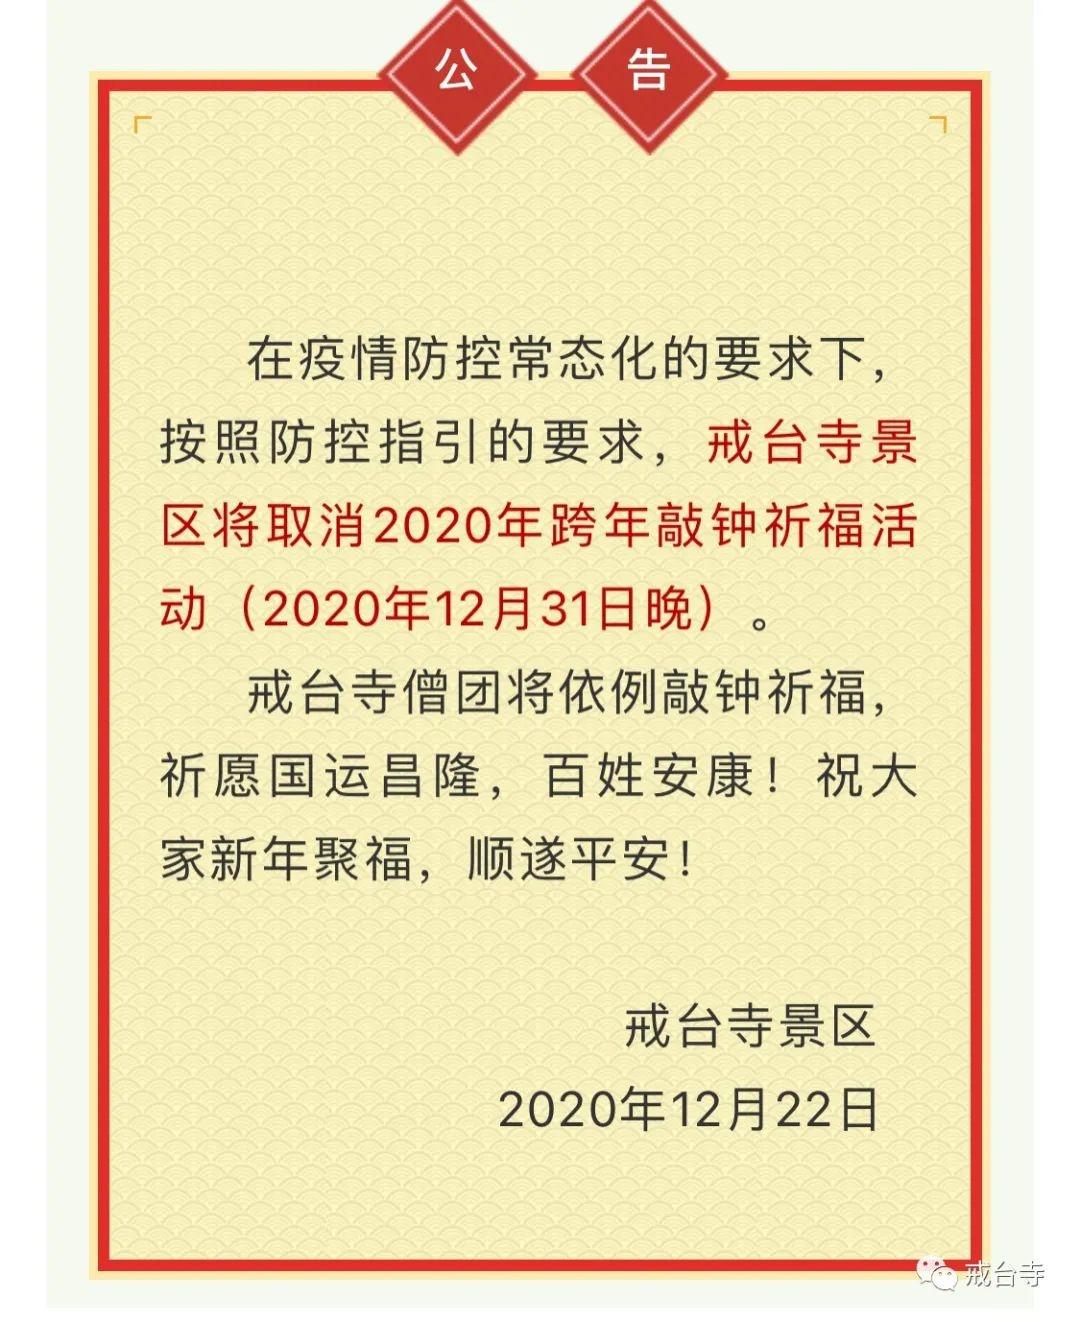 usdt钱包支付(caibao.it):昨日新增8例本土病例!大连一家三口确诊,孩子仅三月龄,北京又增2例,详情宣布 第3张